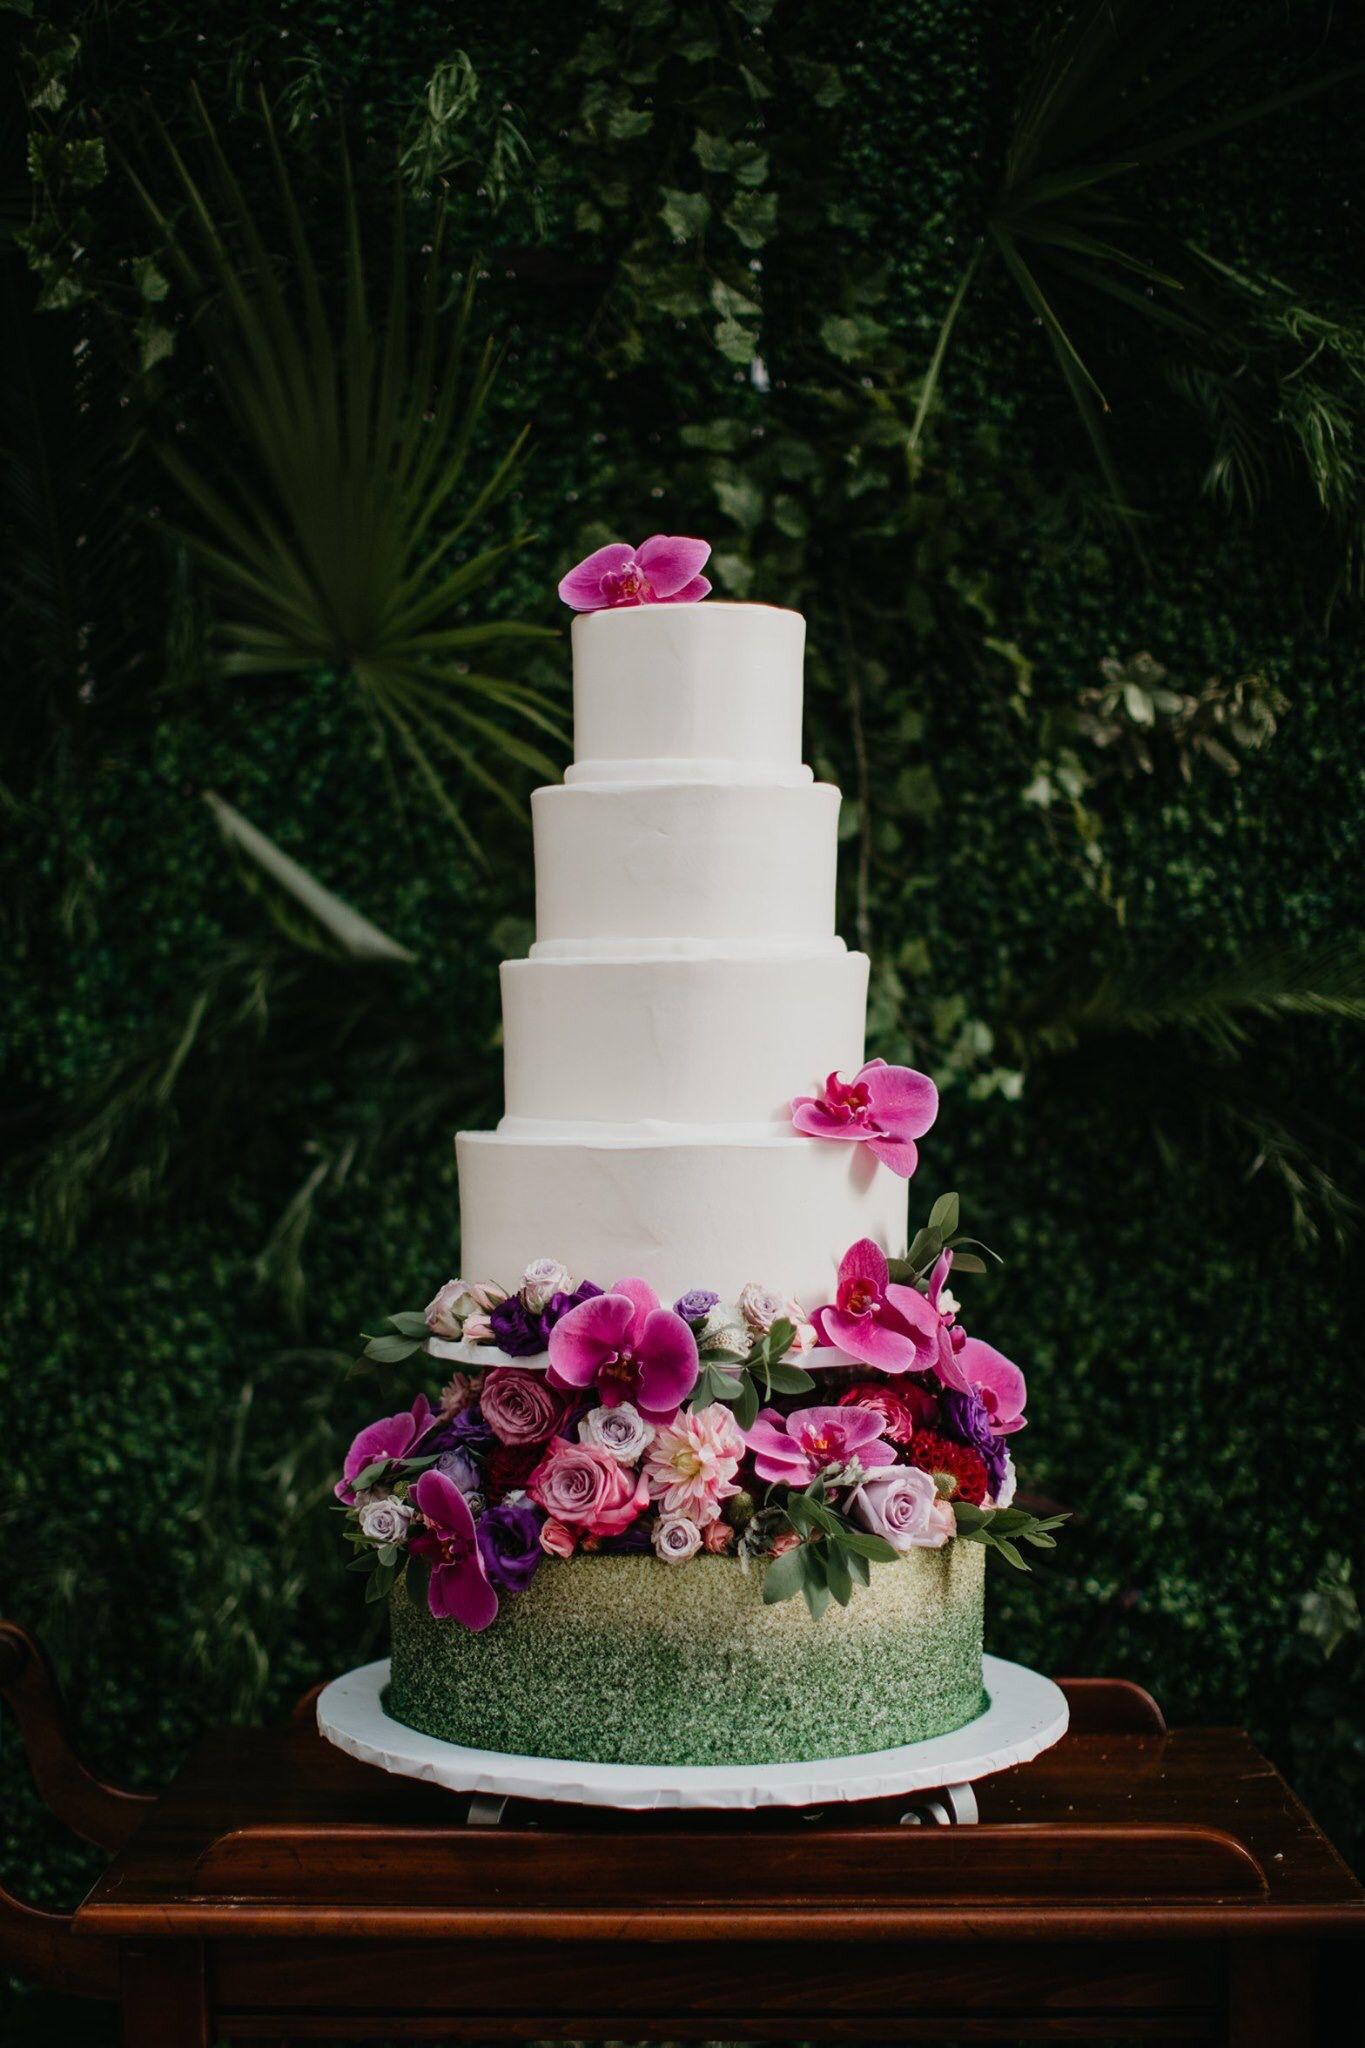 Pin by Orland Park Bakery on Wedding Cakes   Cake, Wedding